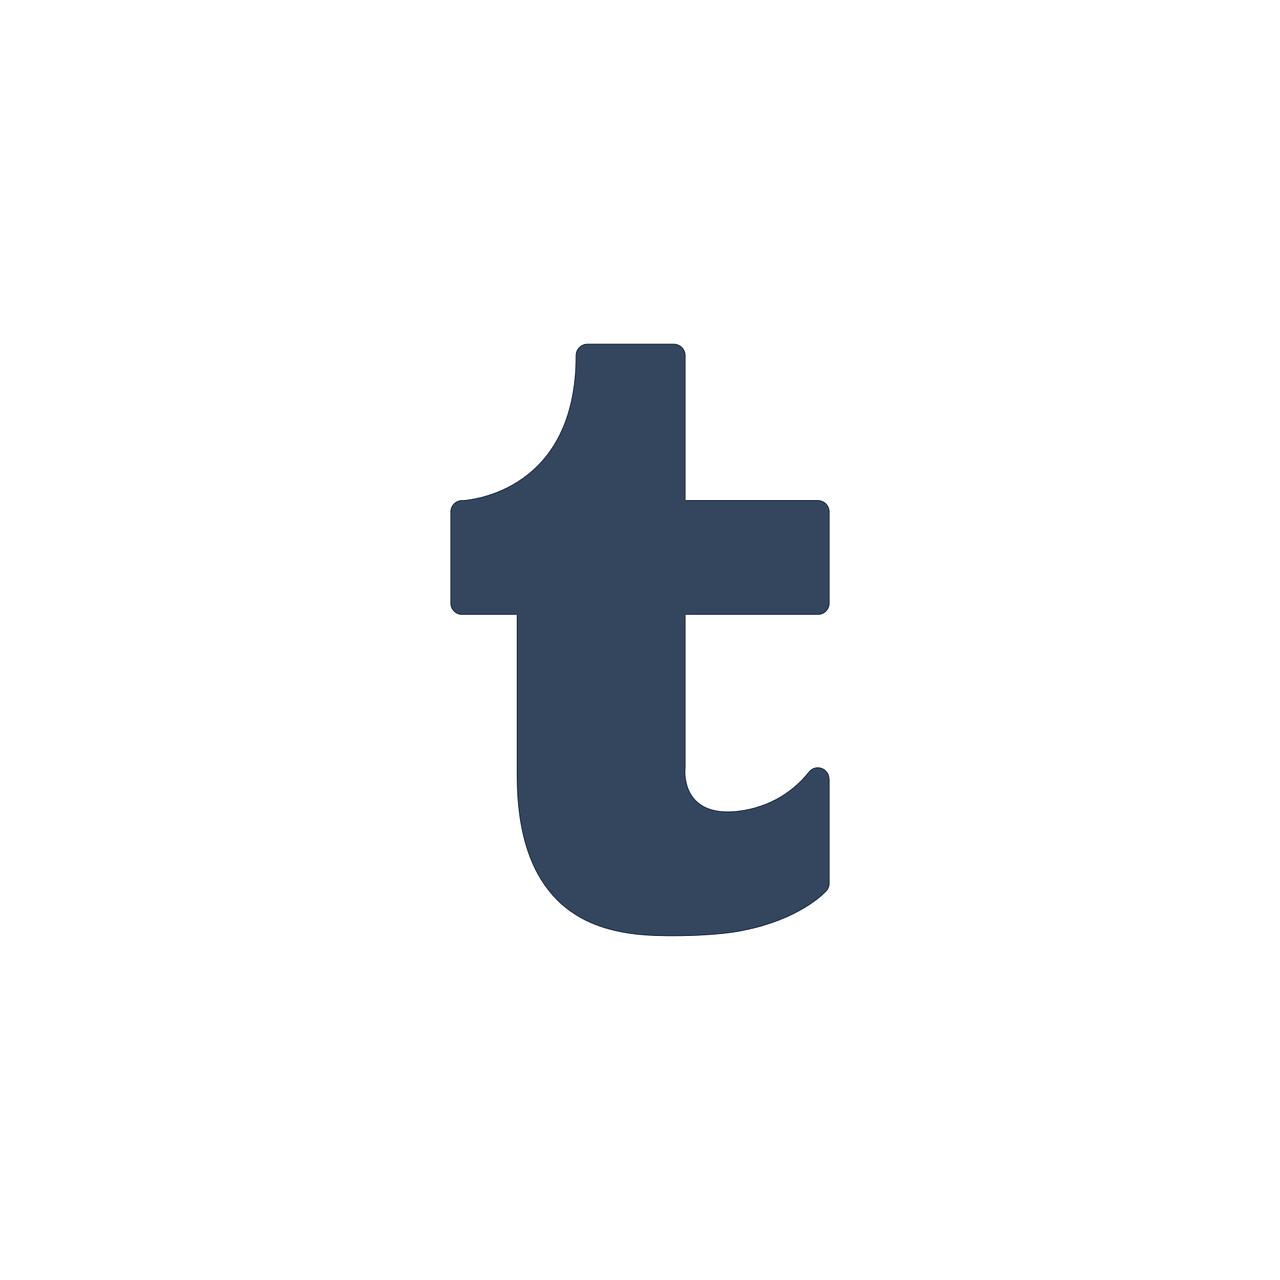 Tumblr Tumblr Symbol Logo   Kostenlose Vektorgrafik auf Pixabay